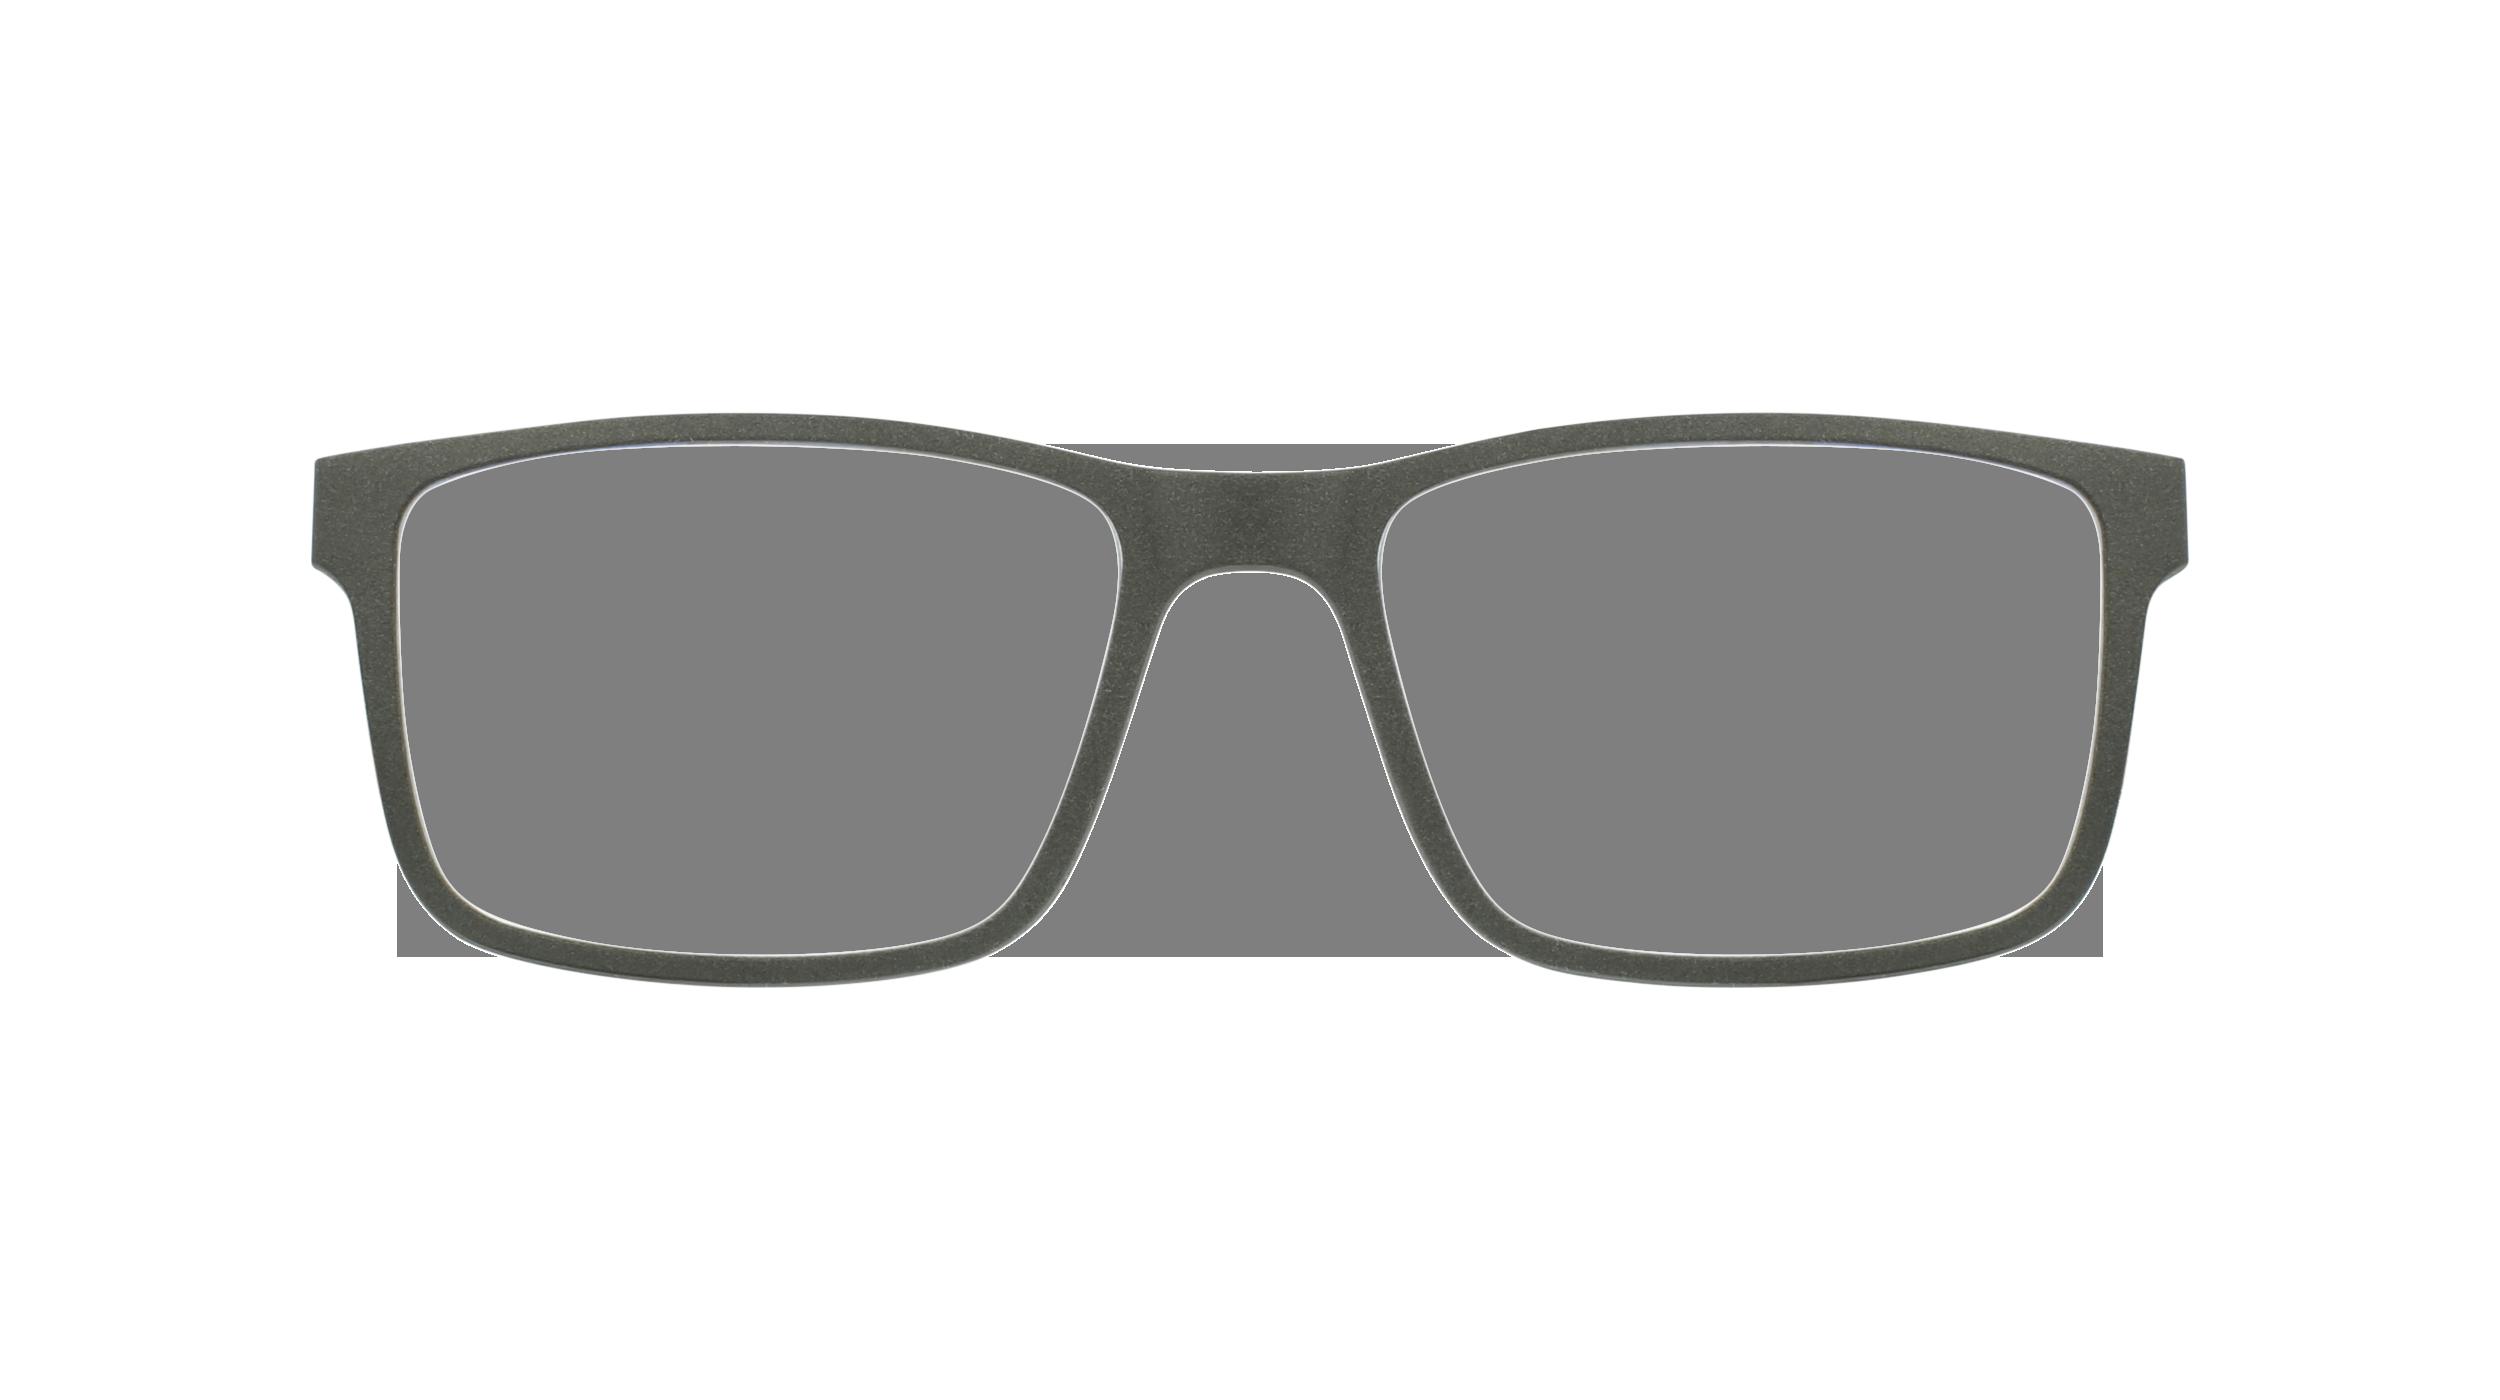 afflelou/france/products/smart_clip/clips_glasses/07630036457467.png